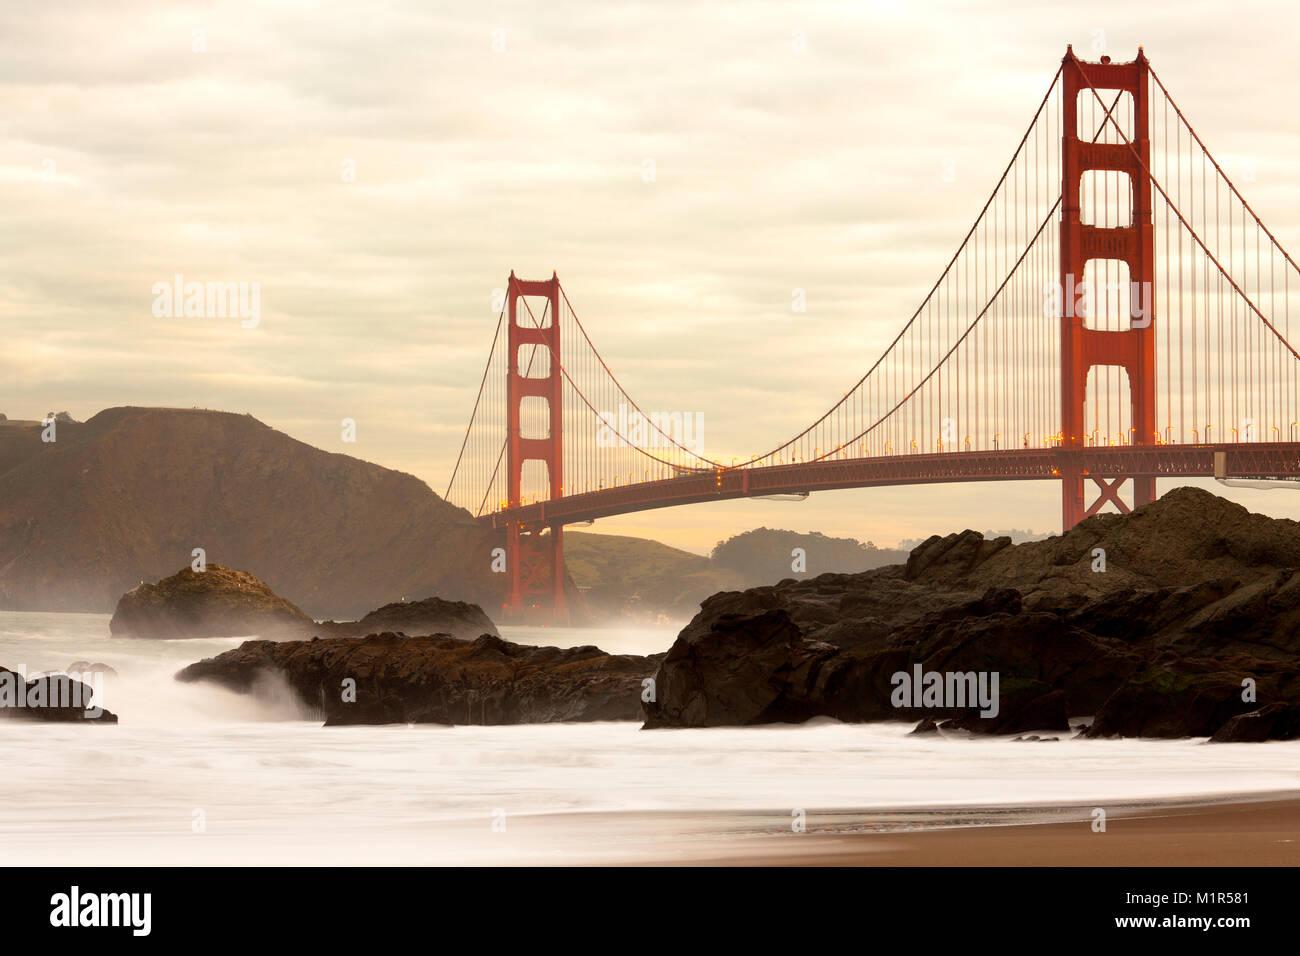 Golden Gate Bridge da Baker Beach, San Francisco, California, Stati Uniti d'America Immagini Stock